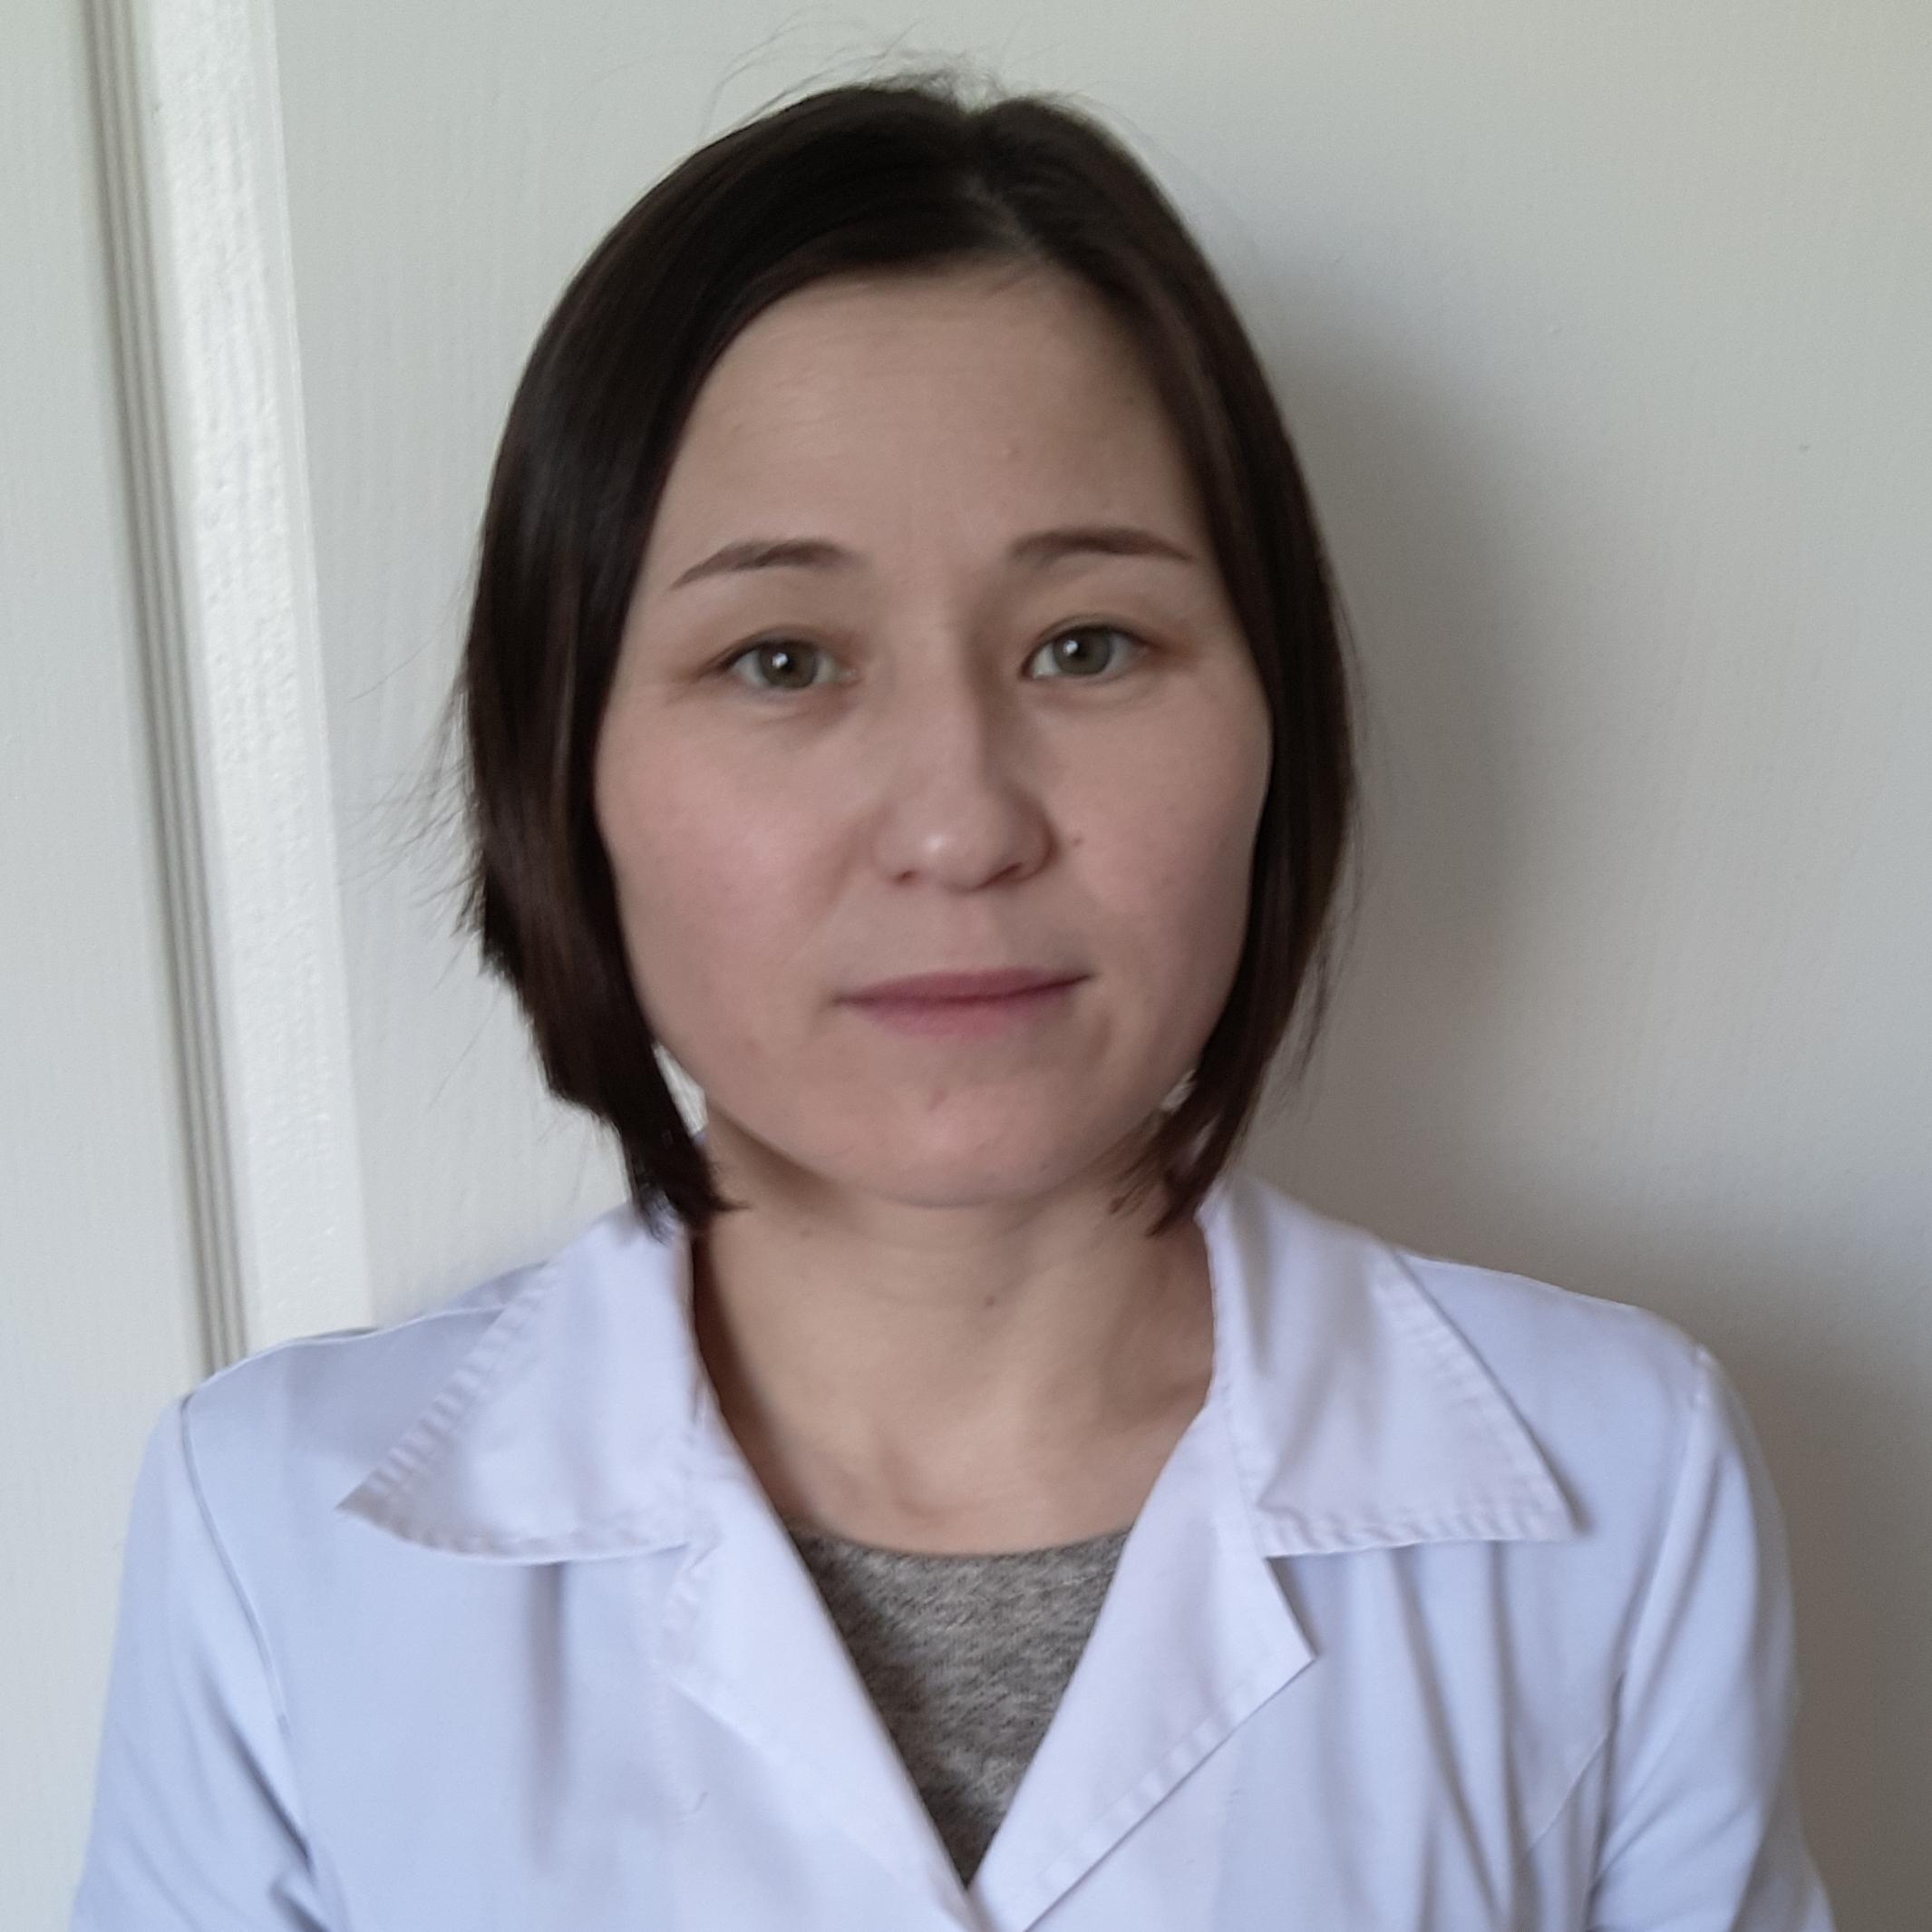 Сальменова Молдир Ануаровна